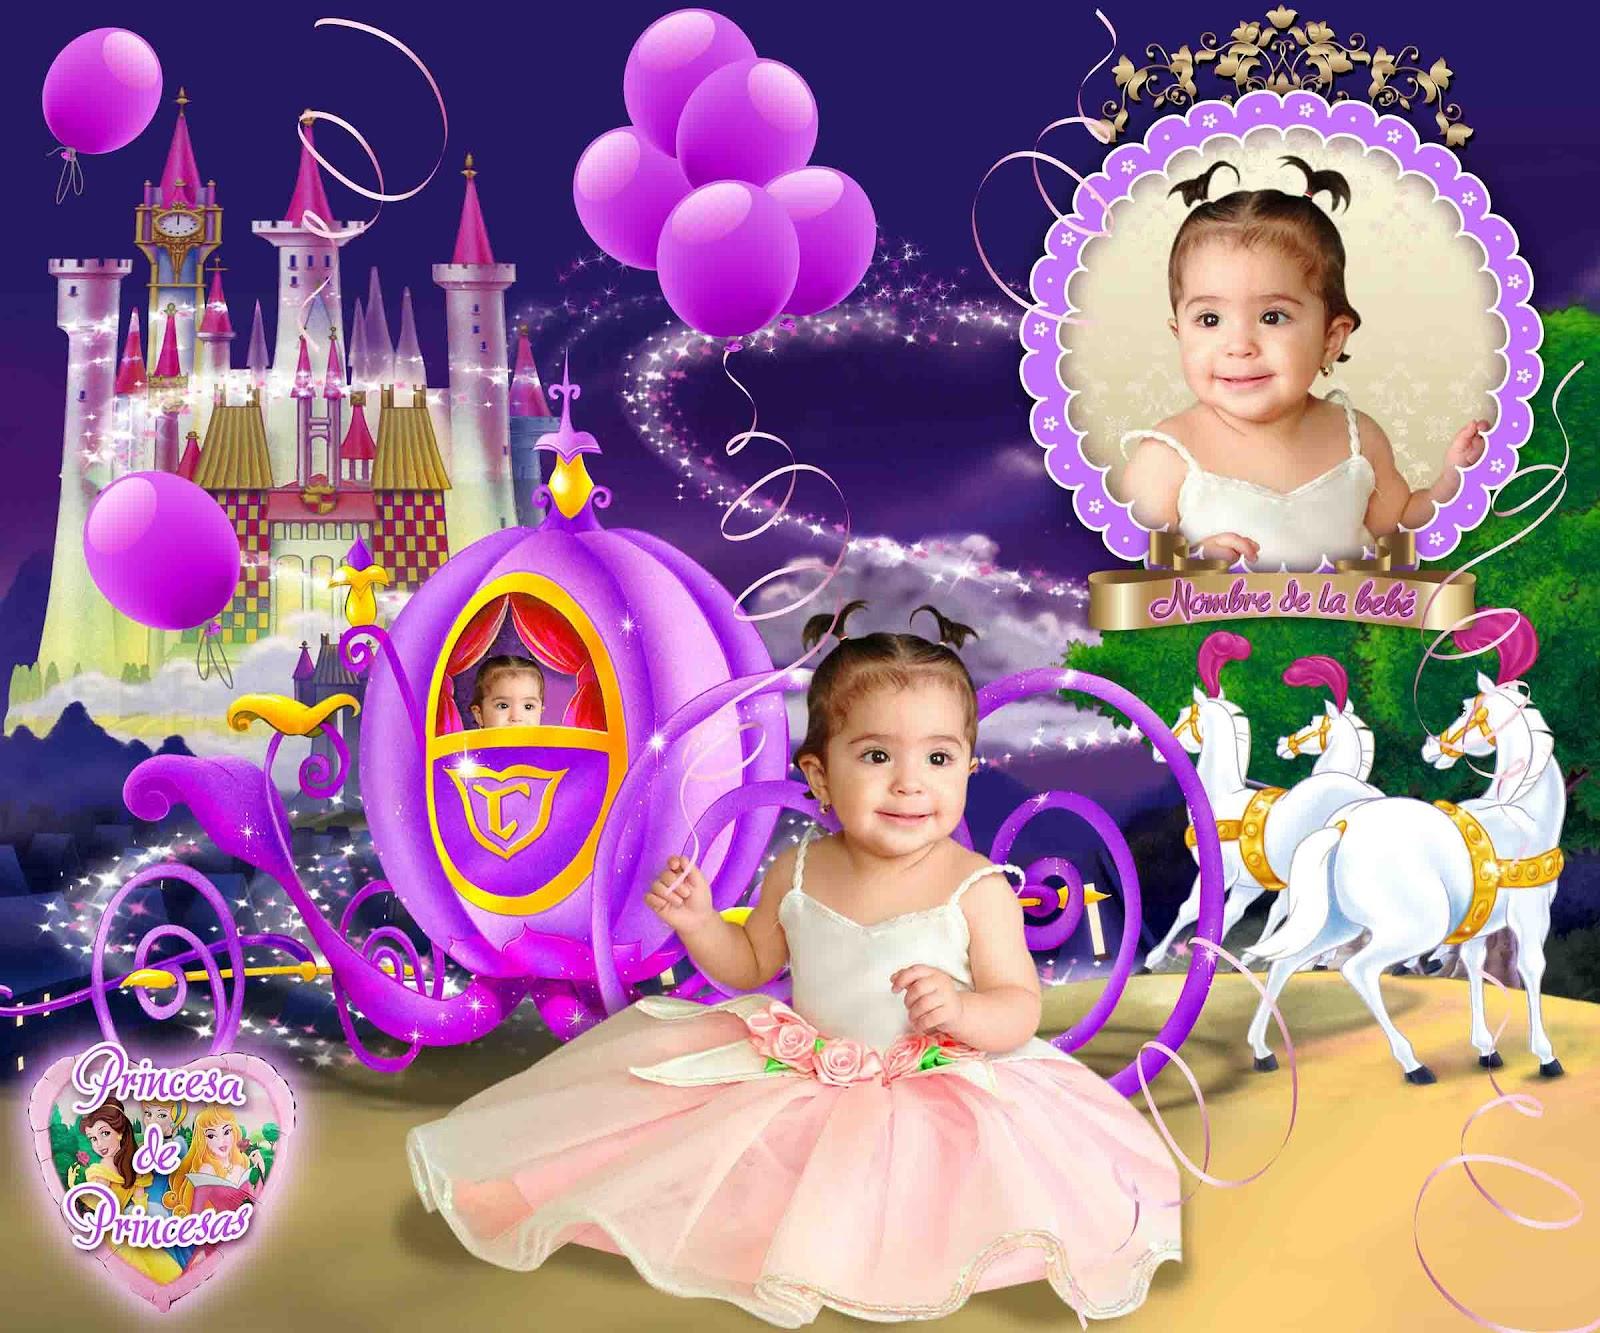 Descargar marcos infantiles de caritas para photoshop gratis - Imagui